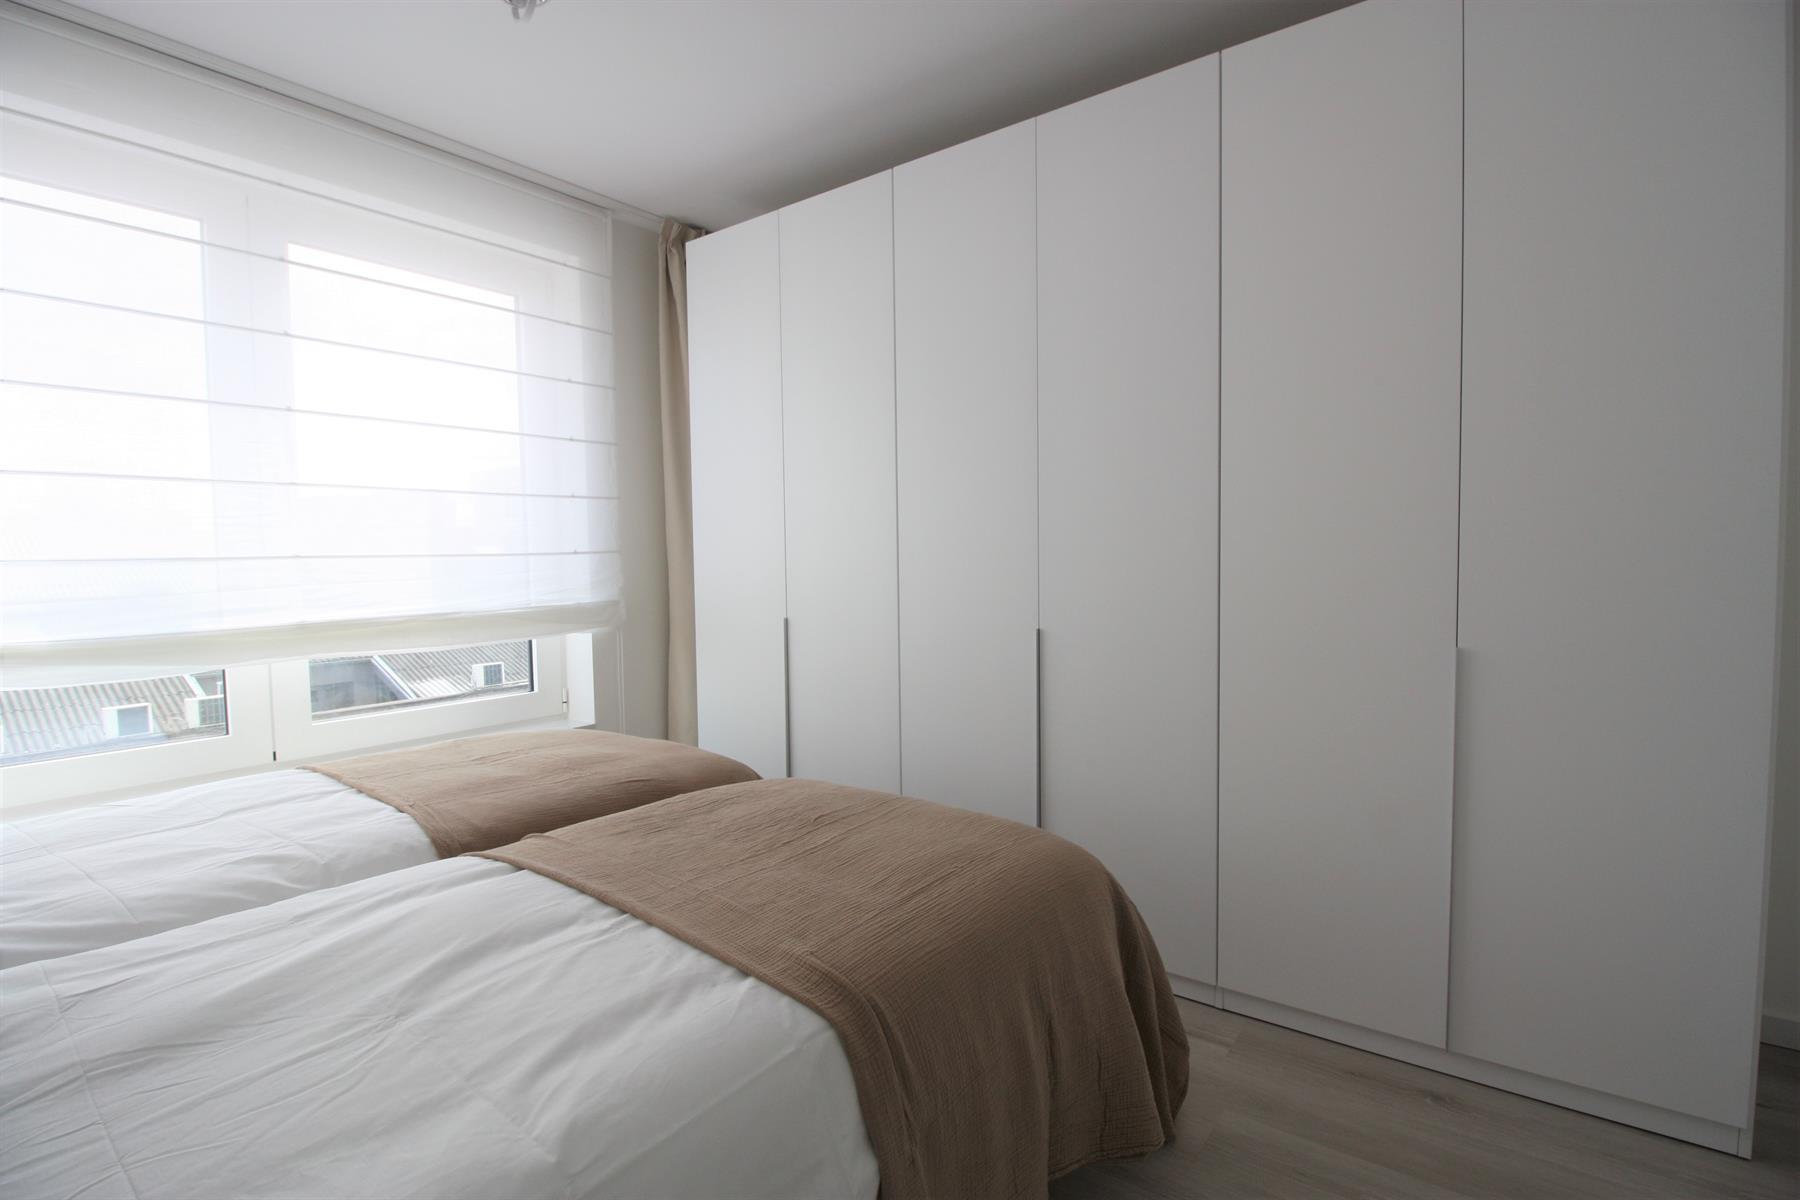 Appartement - Woluwe-Saint-Lambert - #4395355-15